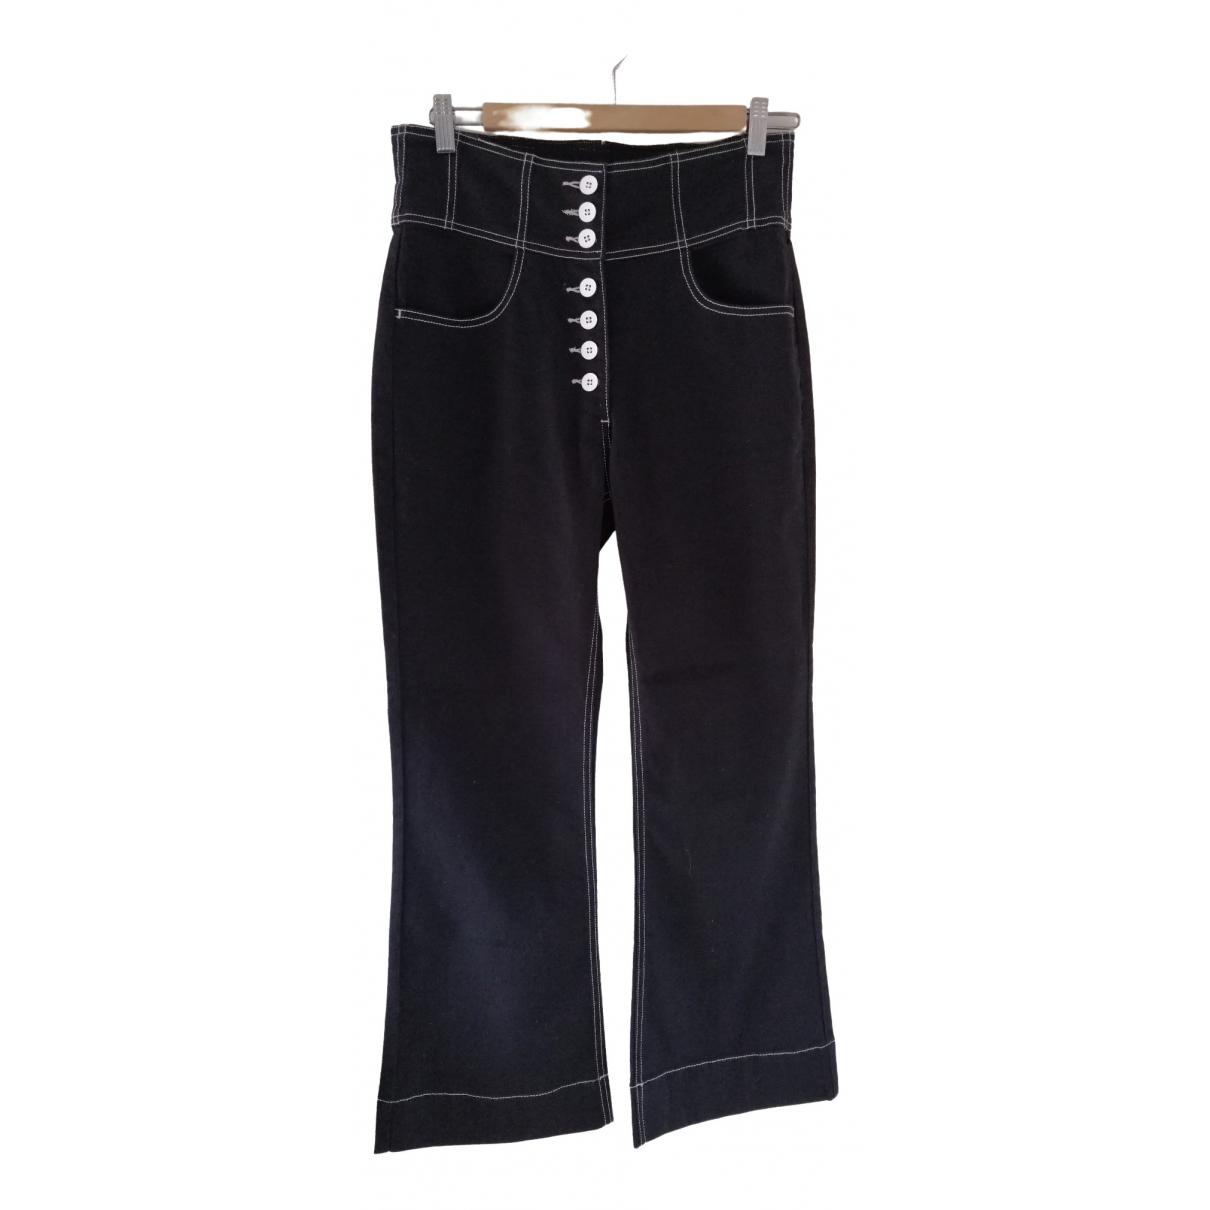 Ulla Johnson \N Black Cotton Trousers for Women 10 US